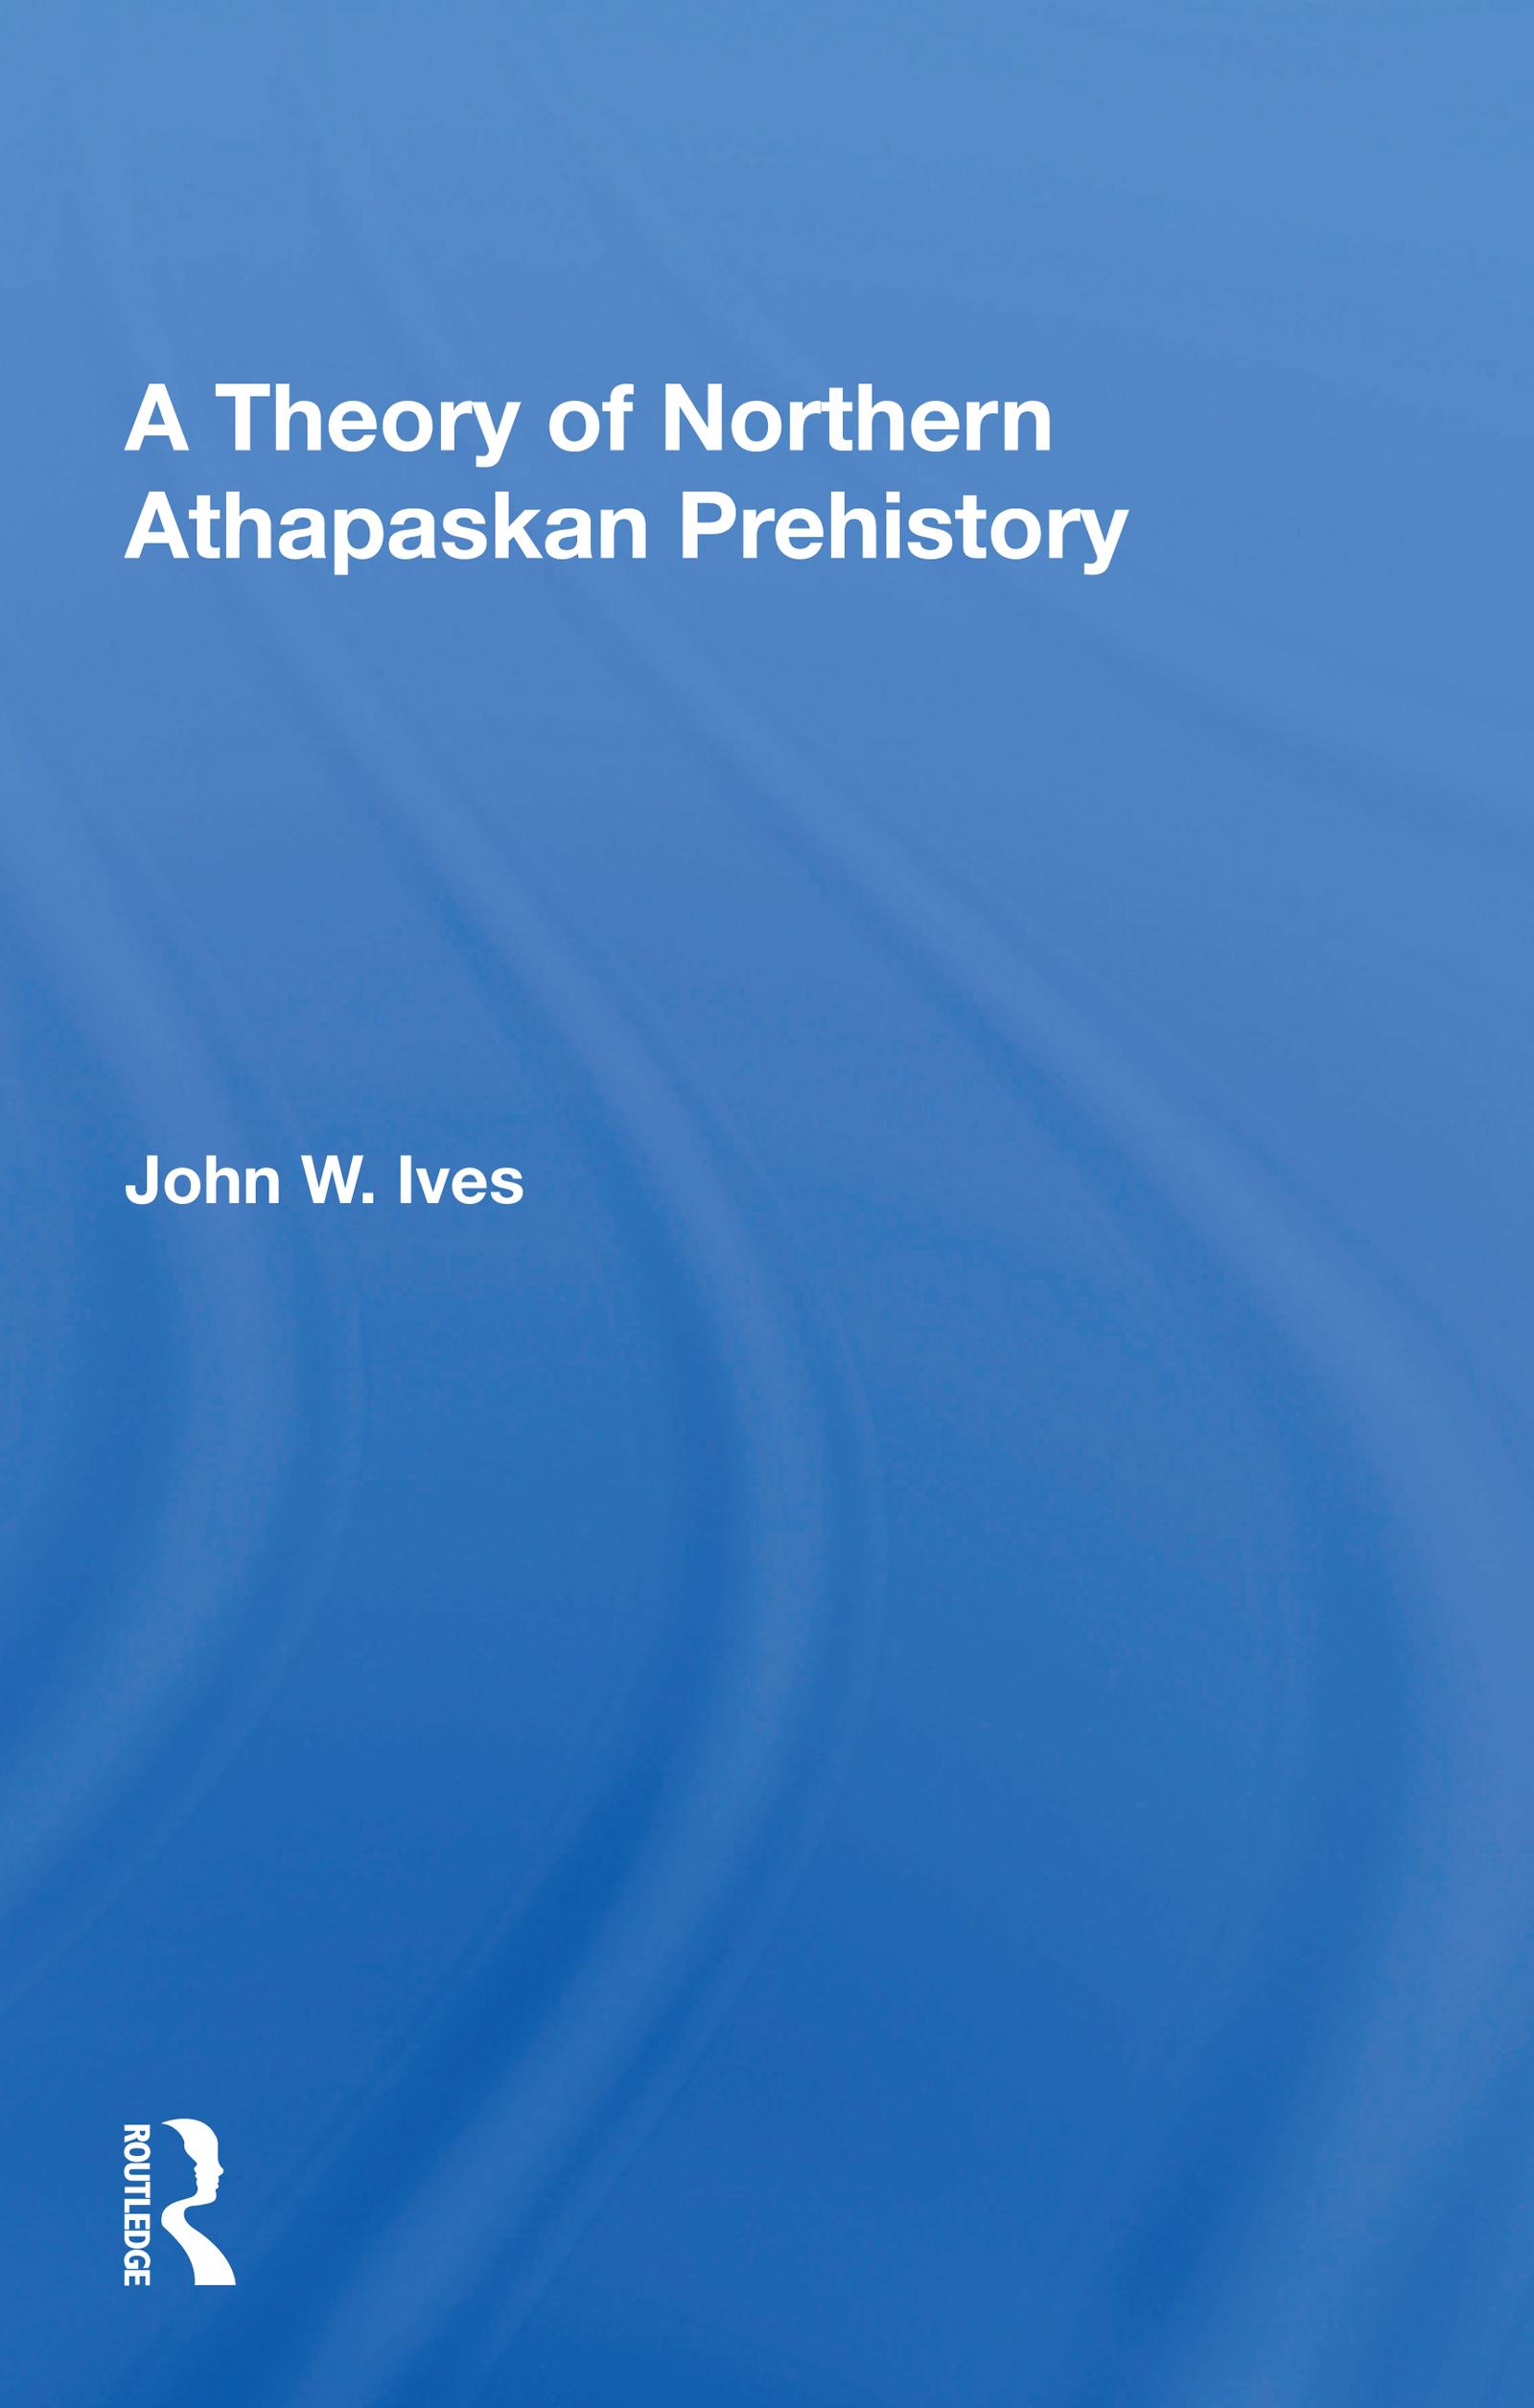 A Theory of Northern Athapaskan Prehistory